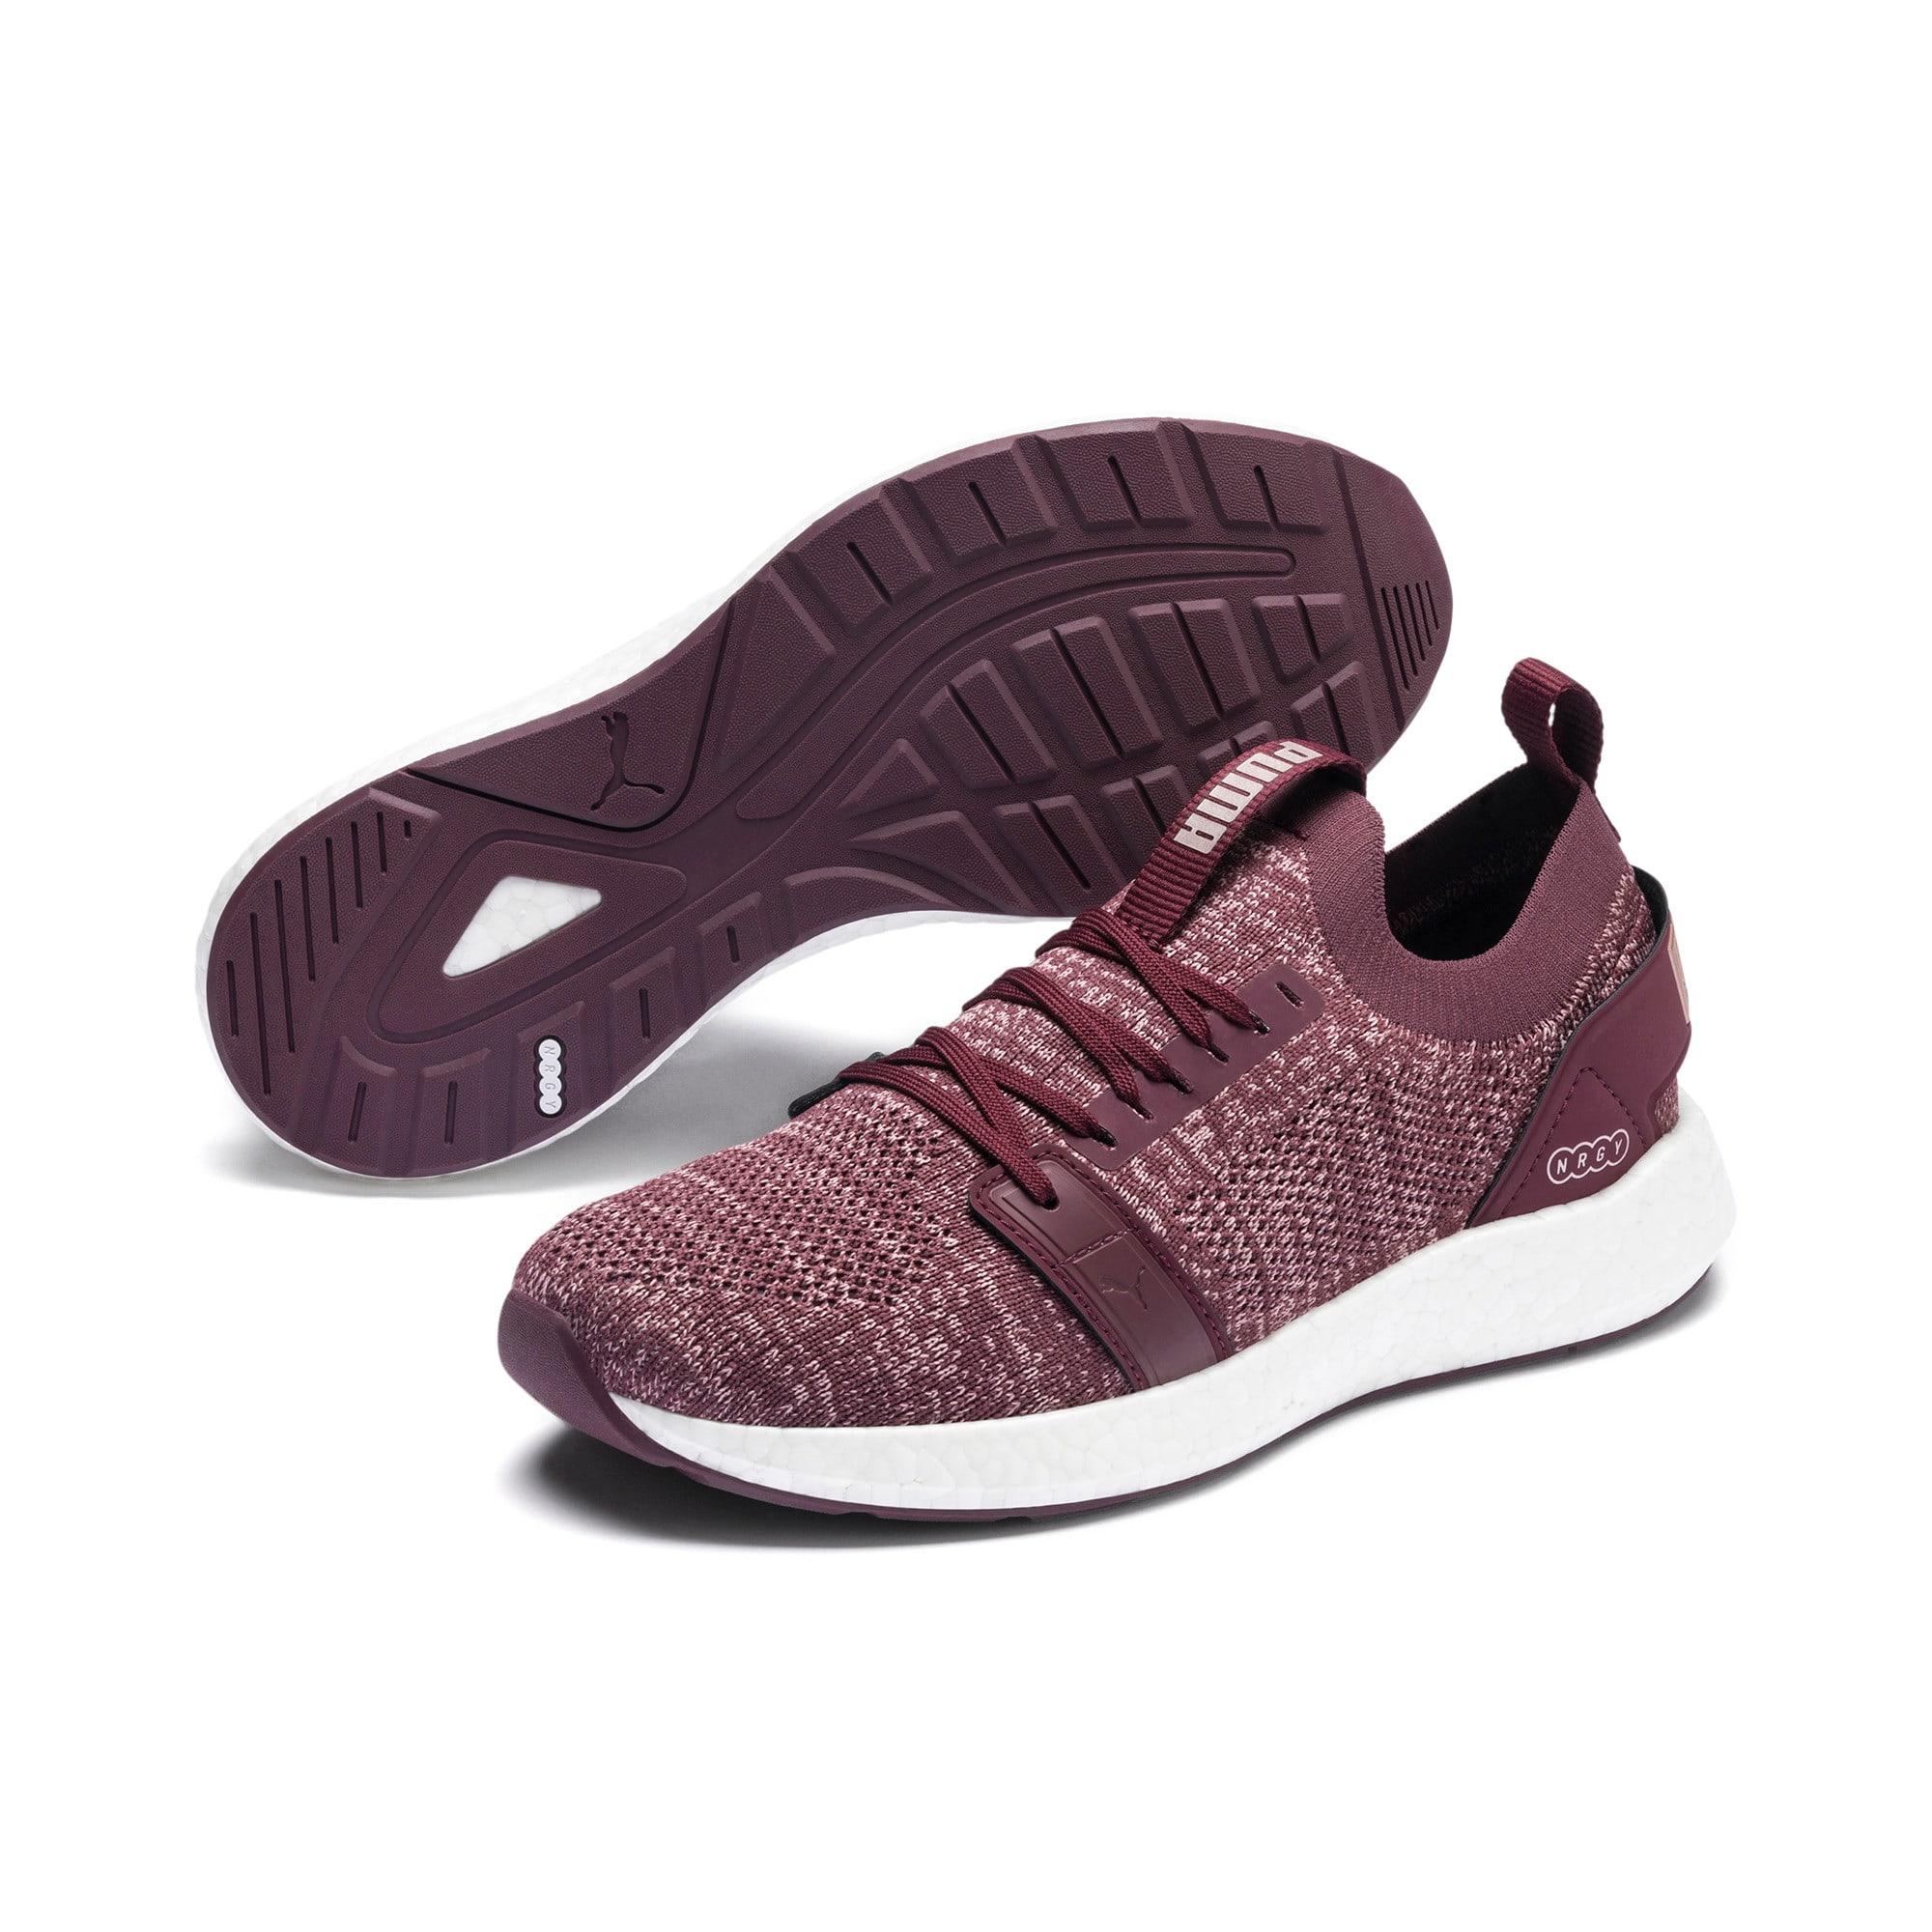 Thumbnail 3 of NRGY Neko Engineer Knit Women's Running Shoes, Vineyard Wine-Rose-White, medium